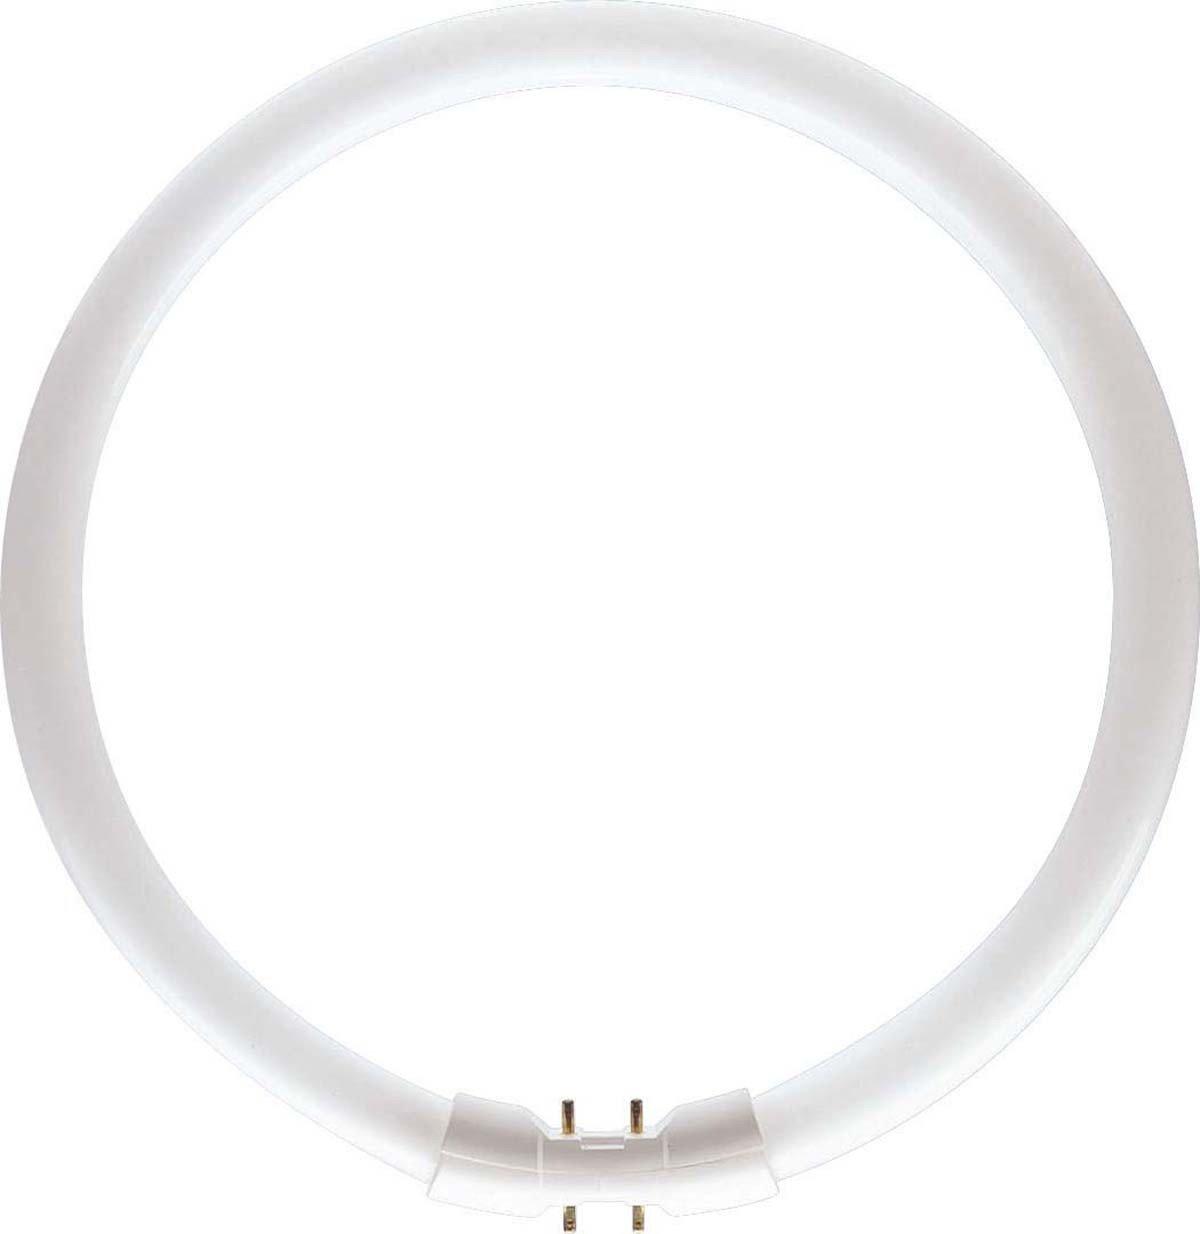 Leuchtstofflampe TL5 C Master 40 Watt 830   Philips